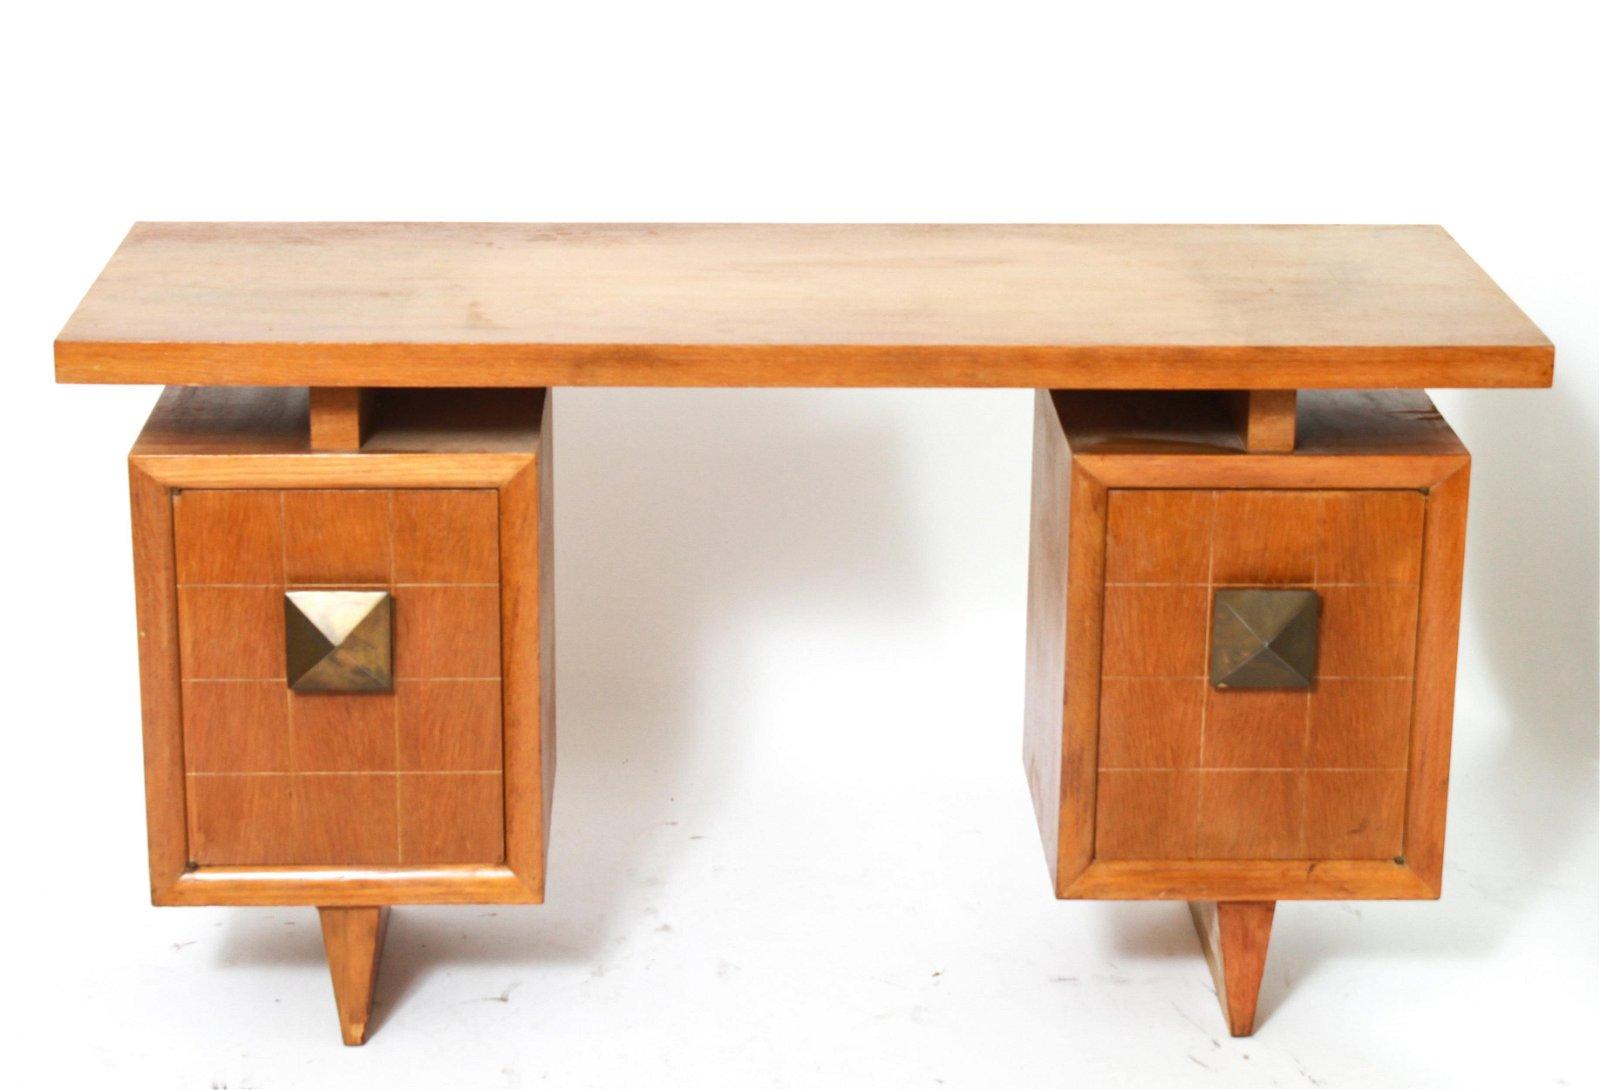 Paul Frankl Style Mid-Century Modern Desk